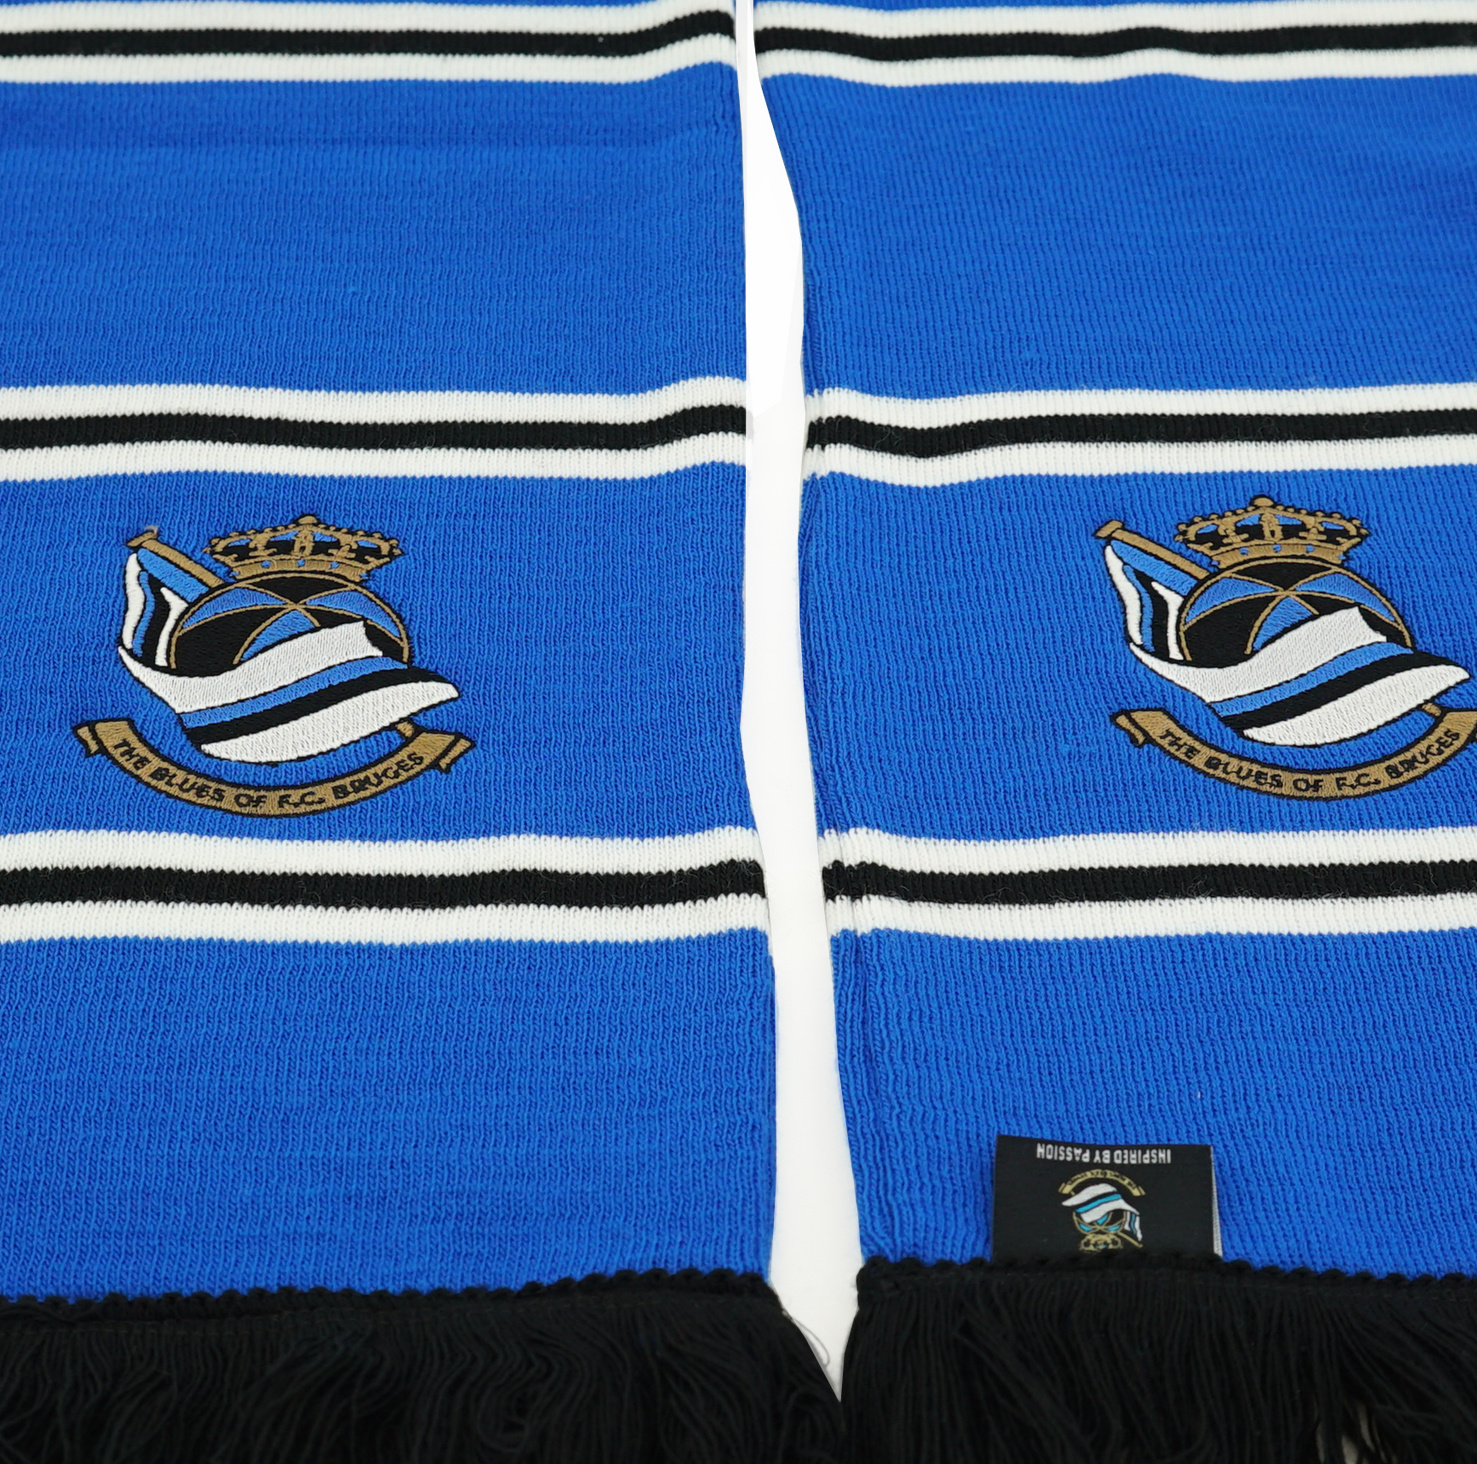 Blokkensjaal blauw - Blues FCB